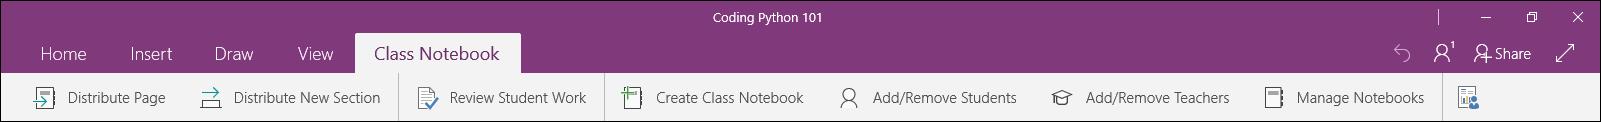 Class Notebook tab menu